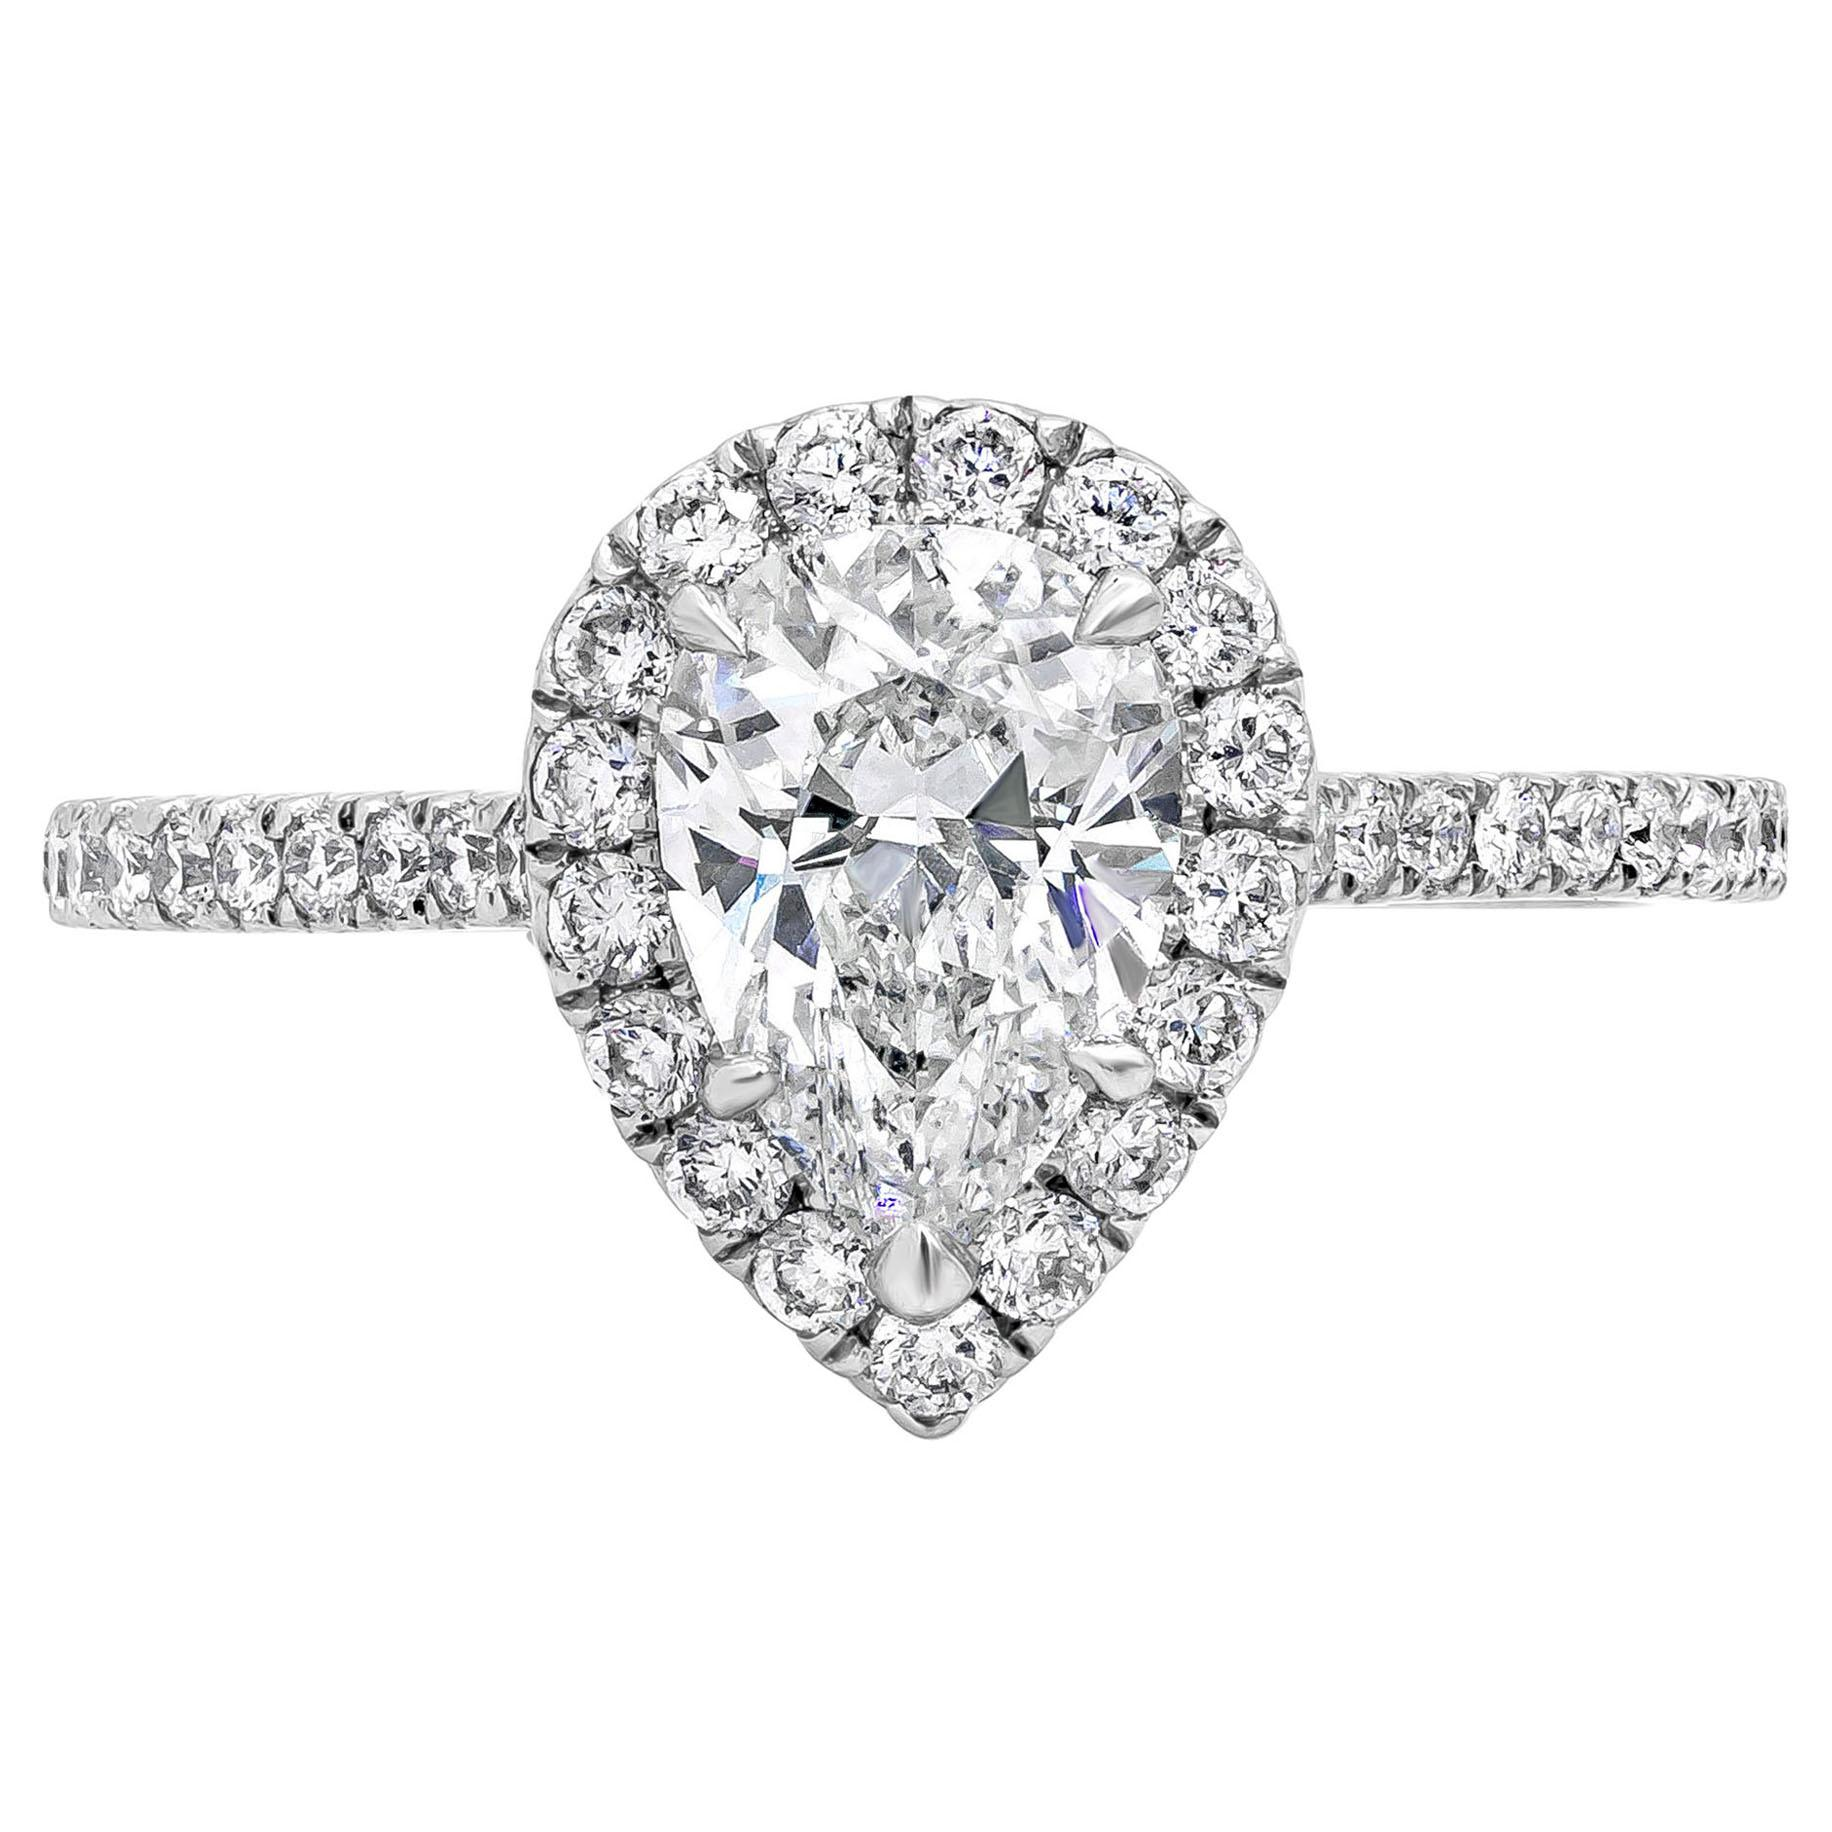 Roman Malakov, GIA Certified 1.16 Carat Pear Shape Diamond Halo Engagement Ring